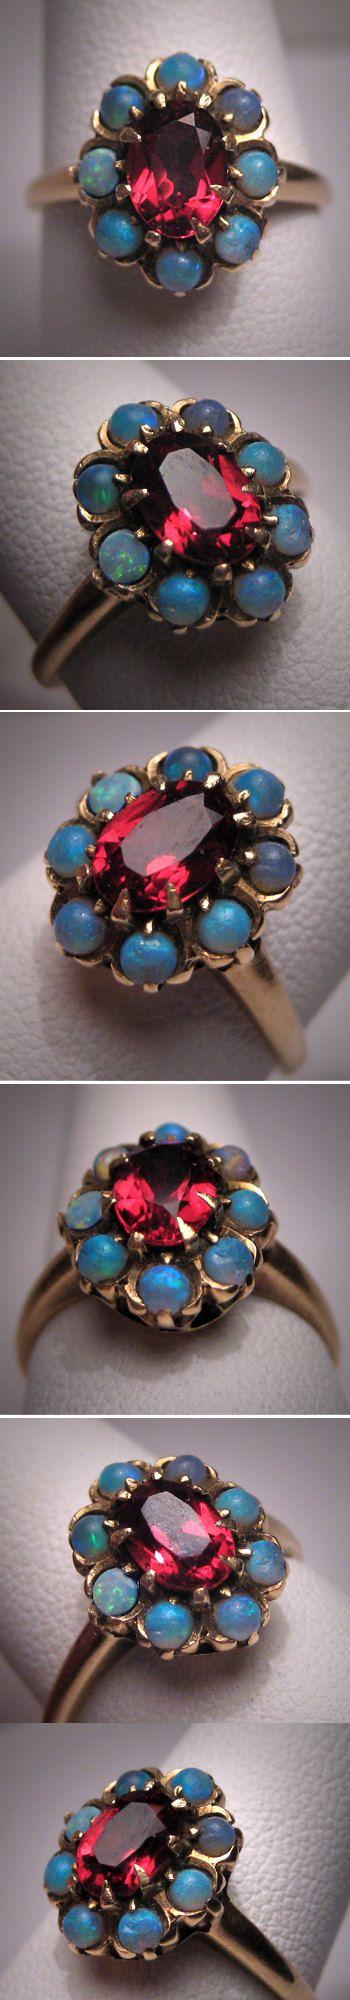 Antique Opal Garnet Ring Gold Vintage Victorian Wedding $895